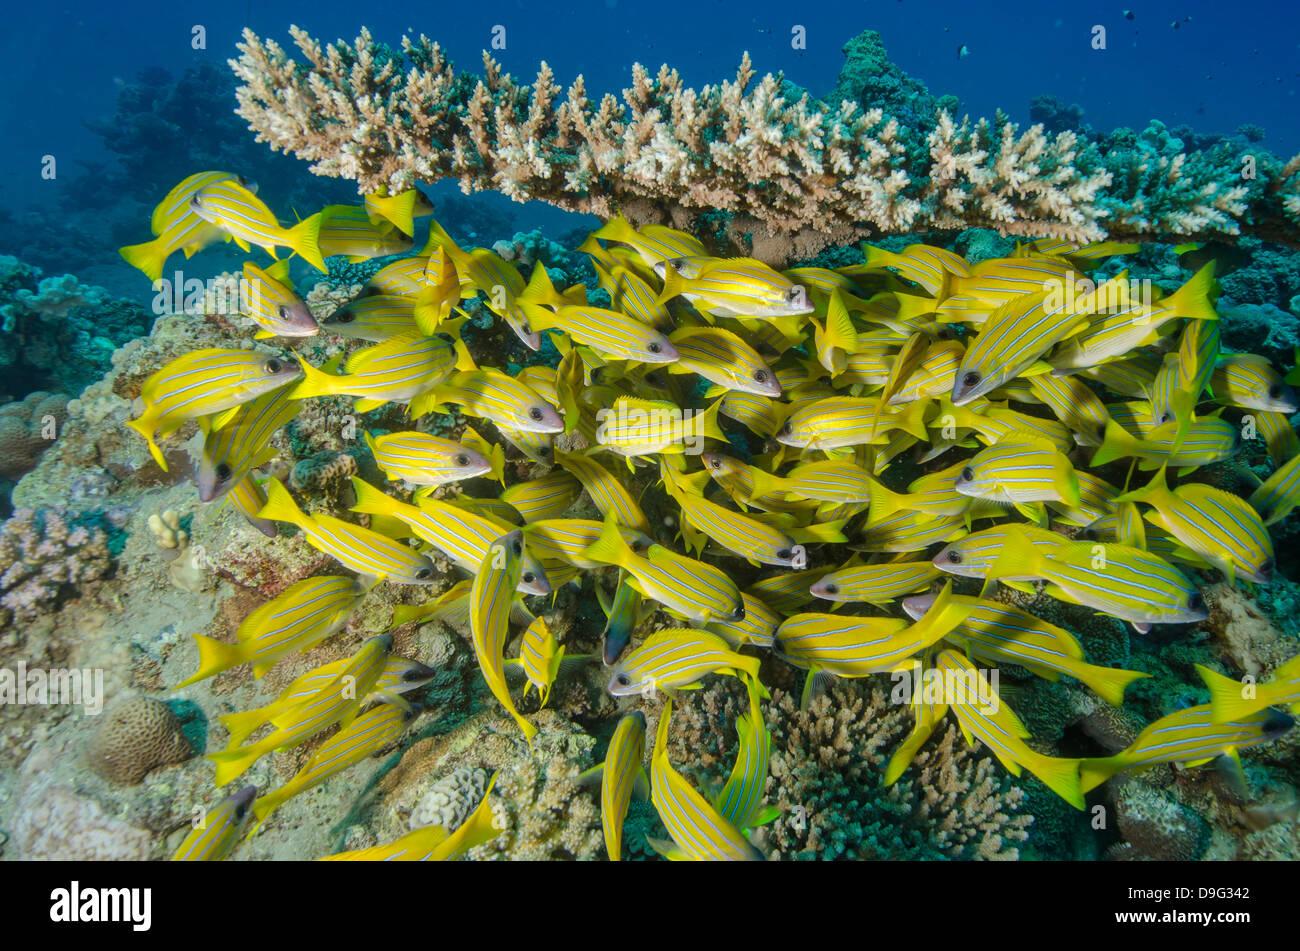 School of blue striped snapper (Lutjanus kasmira) underneath table coral, Naama Bay, Sinai, Red Sea, Egypt, Africa Stock Photo